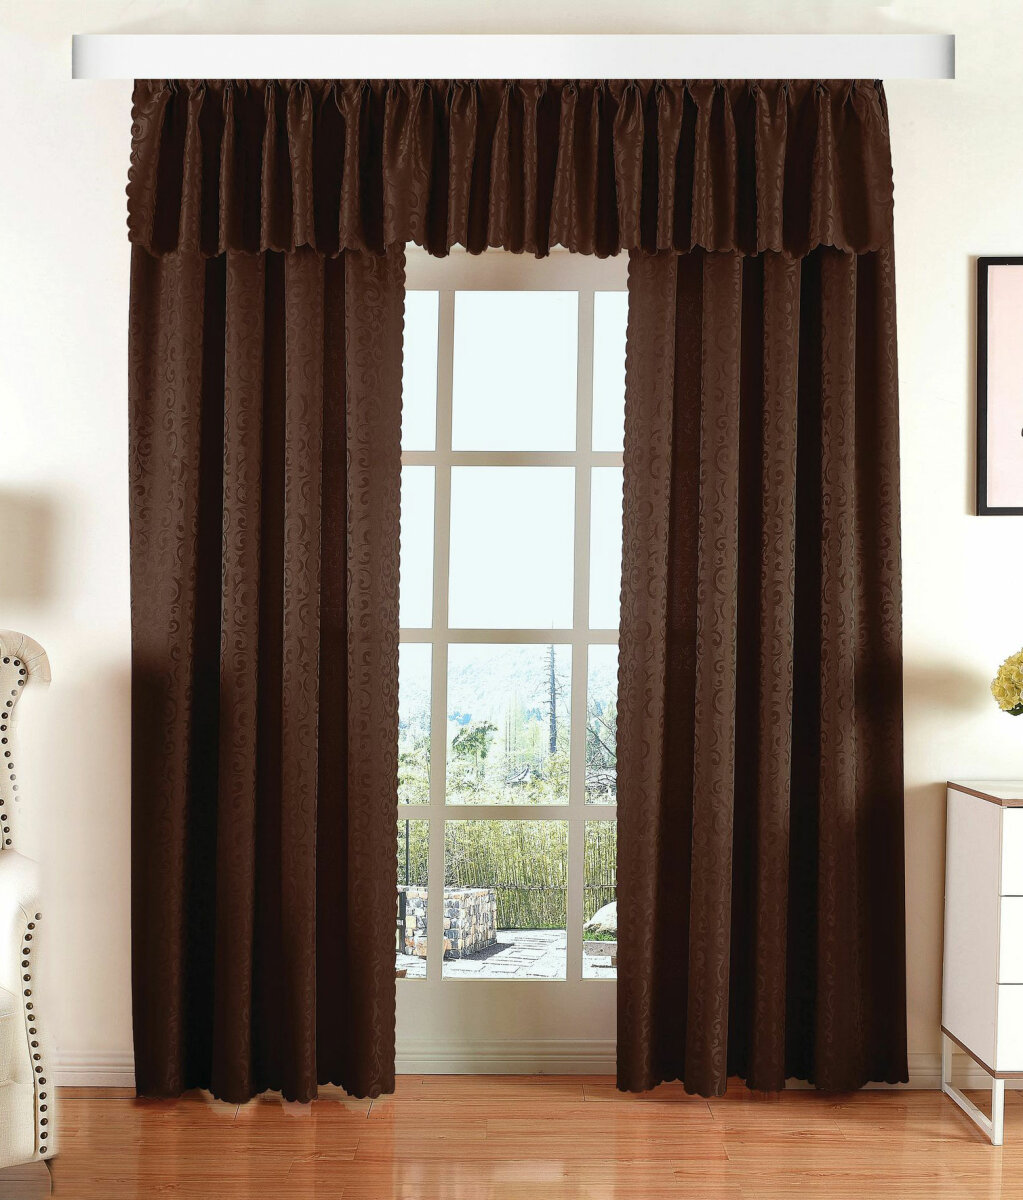 halley damast gardinen set vorhang und querbehang